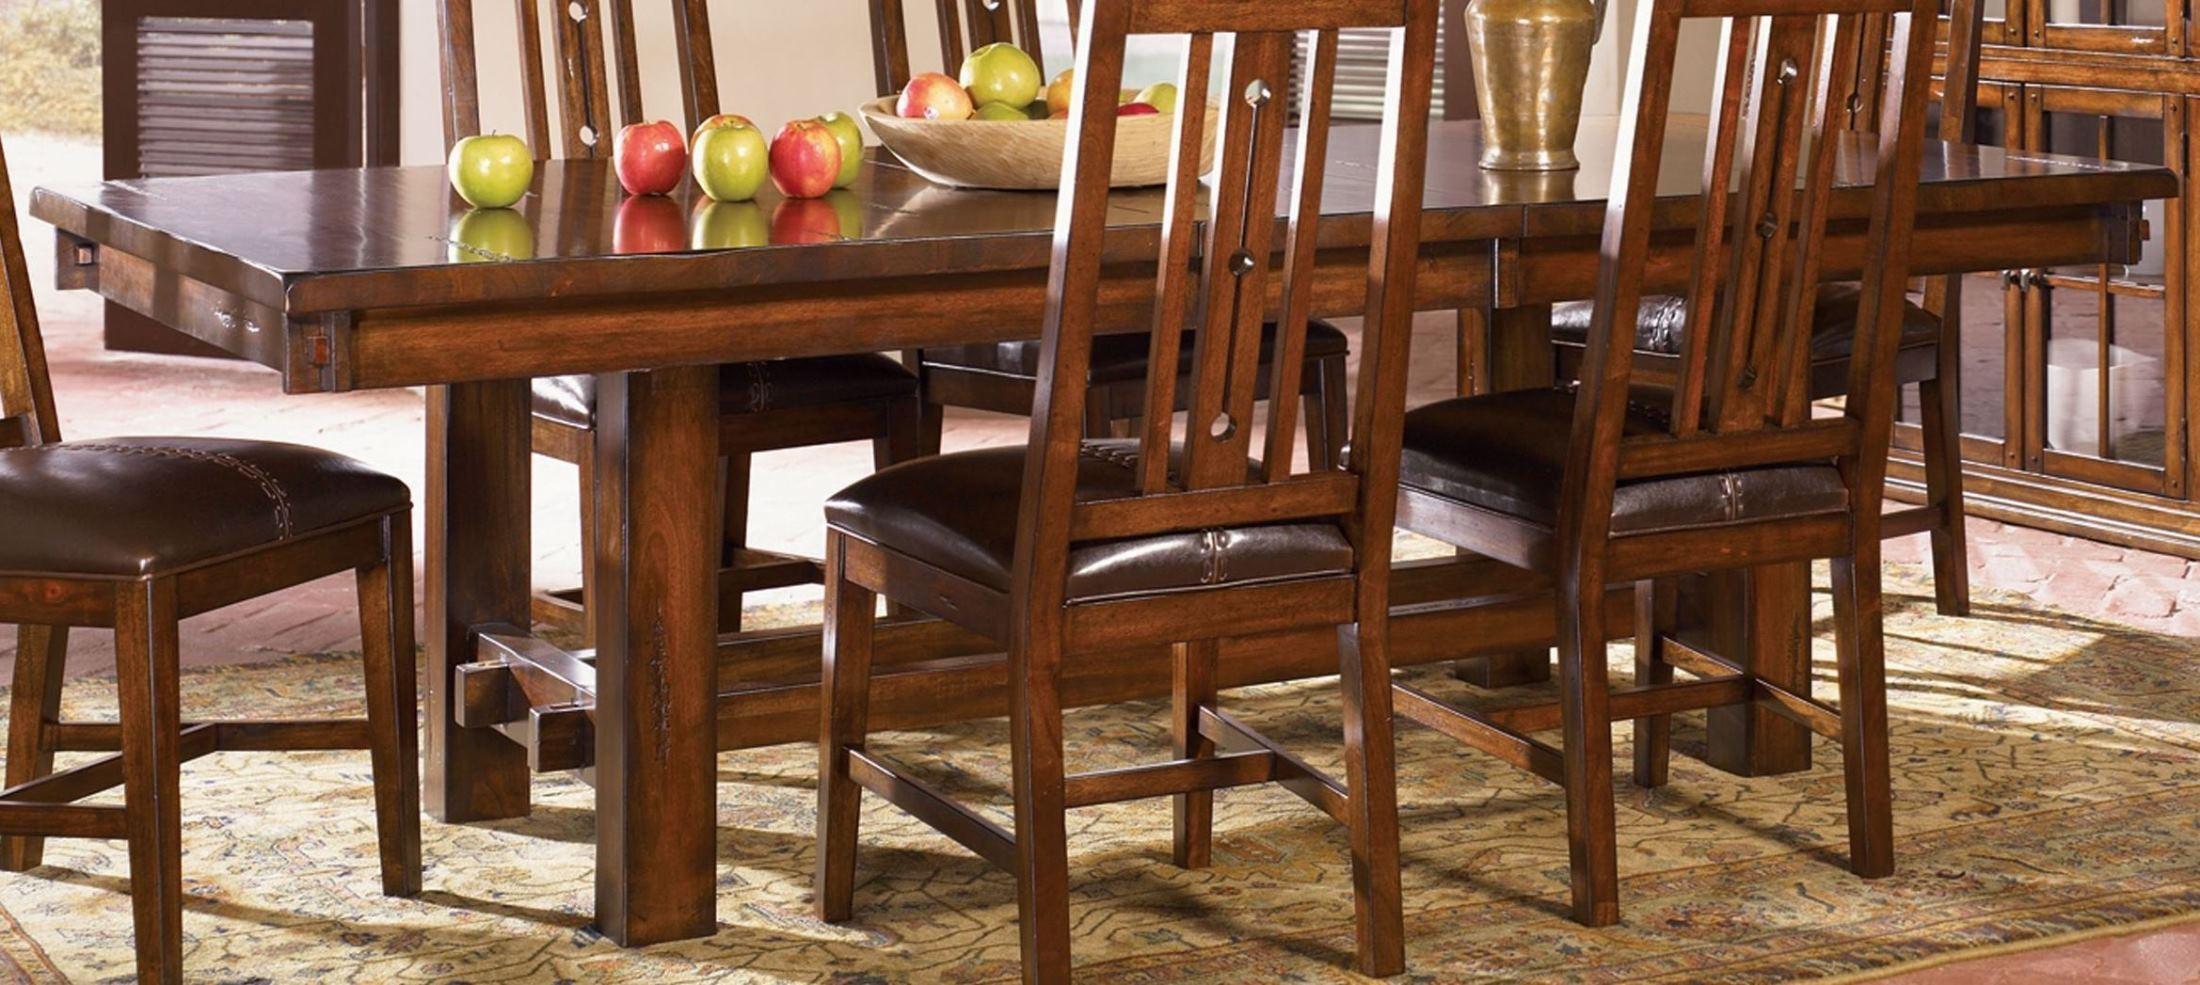 mesa rustica 92 aged mahogany extendable trestle dining table mesam6370 a america. Black Bedroom Furniture Sets. Home Design Ideas